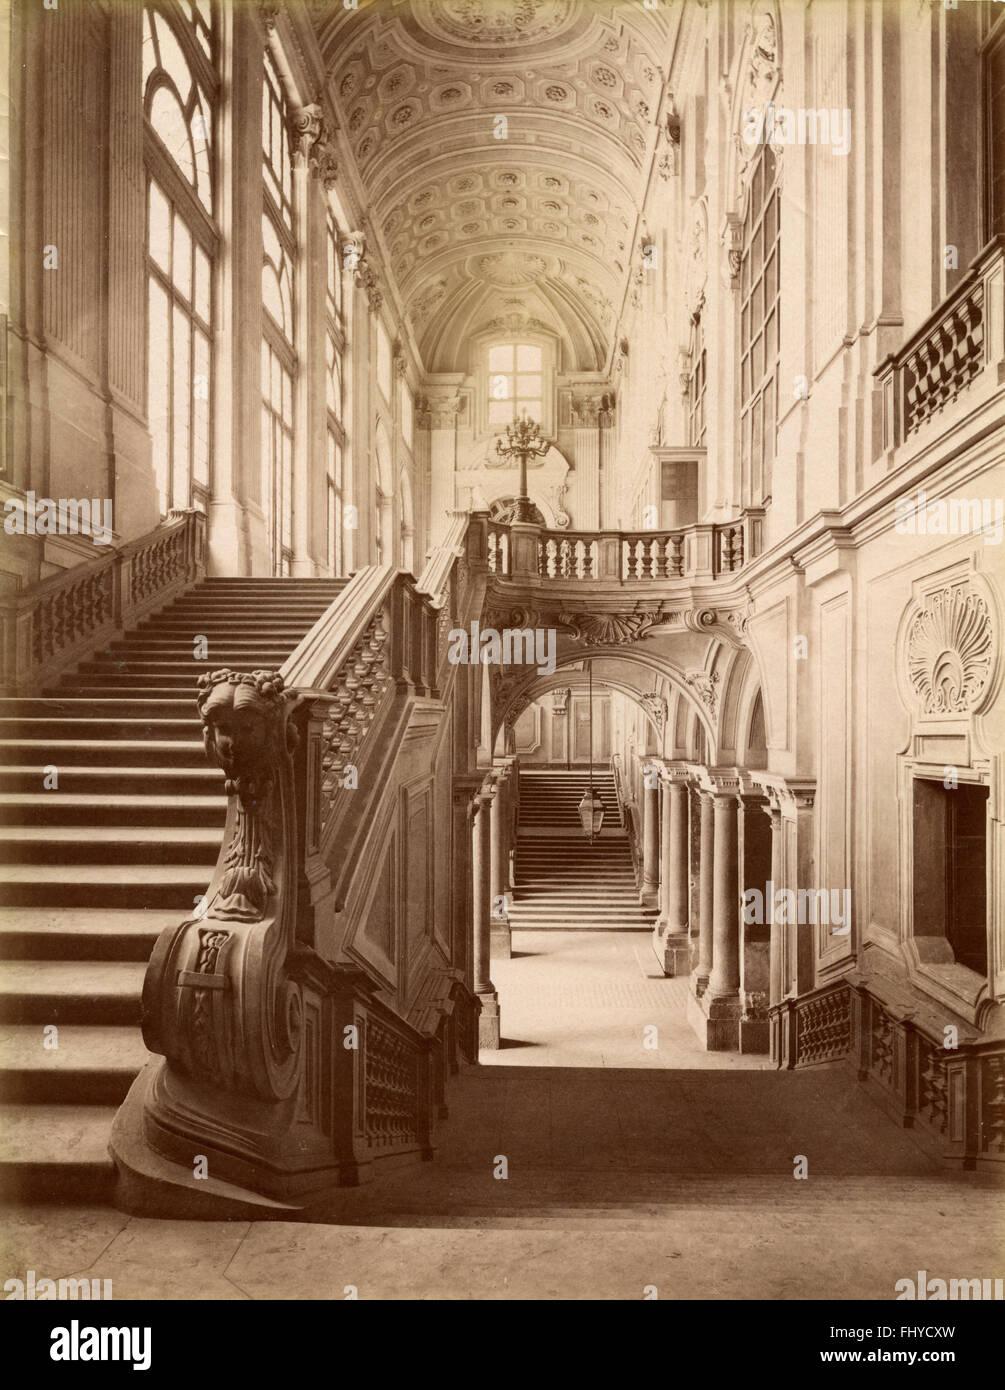 Staircase of honor, Palazzo Madama, Turin, Italy - Stock Image